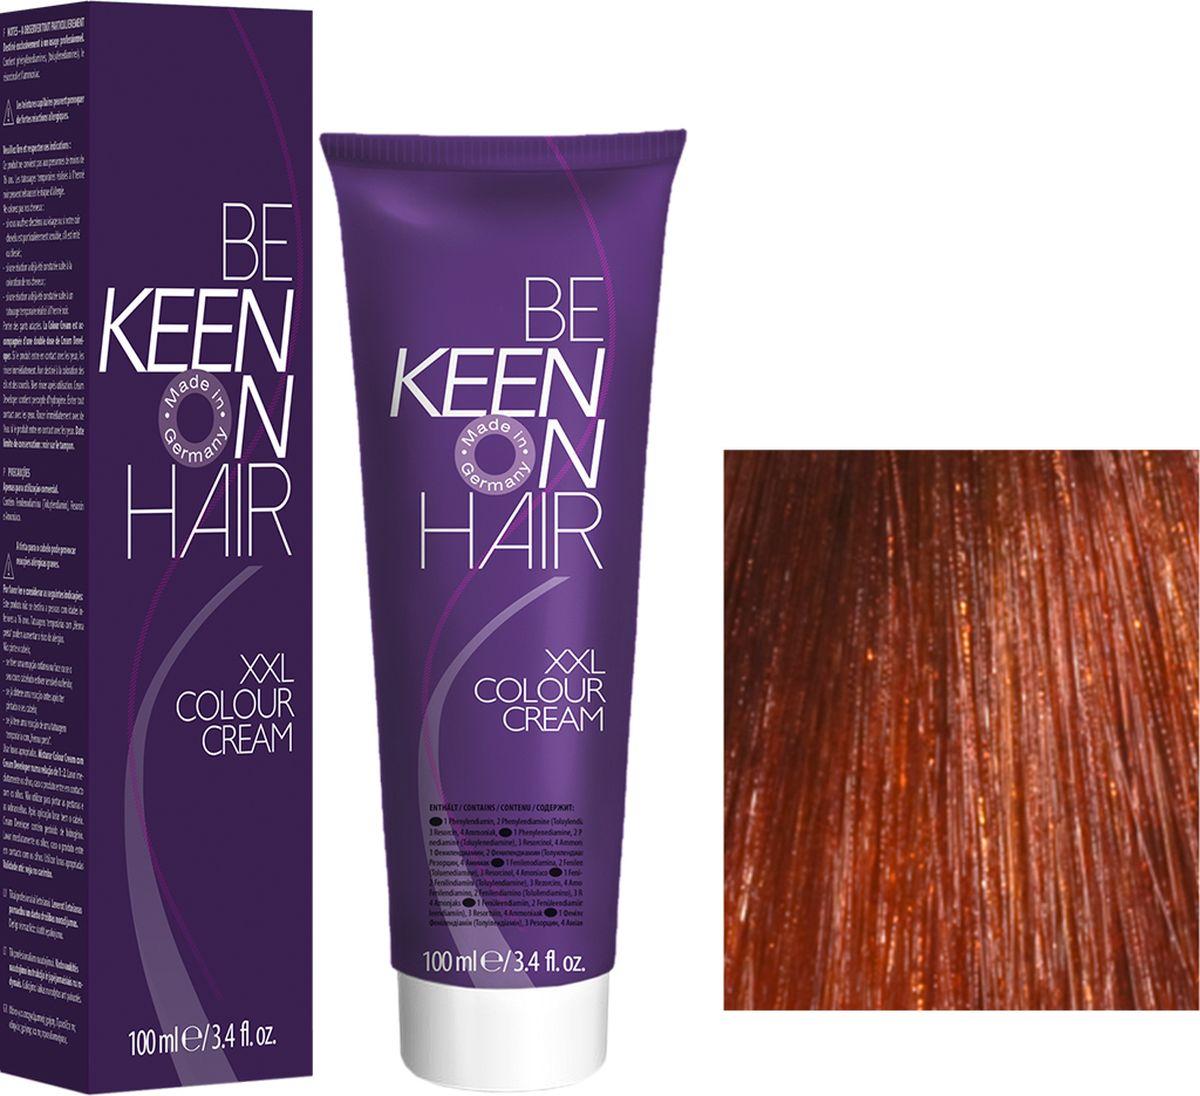 Keen Краска для волос 7.4 Натуральный медный блондин Mittelblond Kupfer, 100 мл